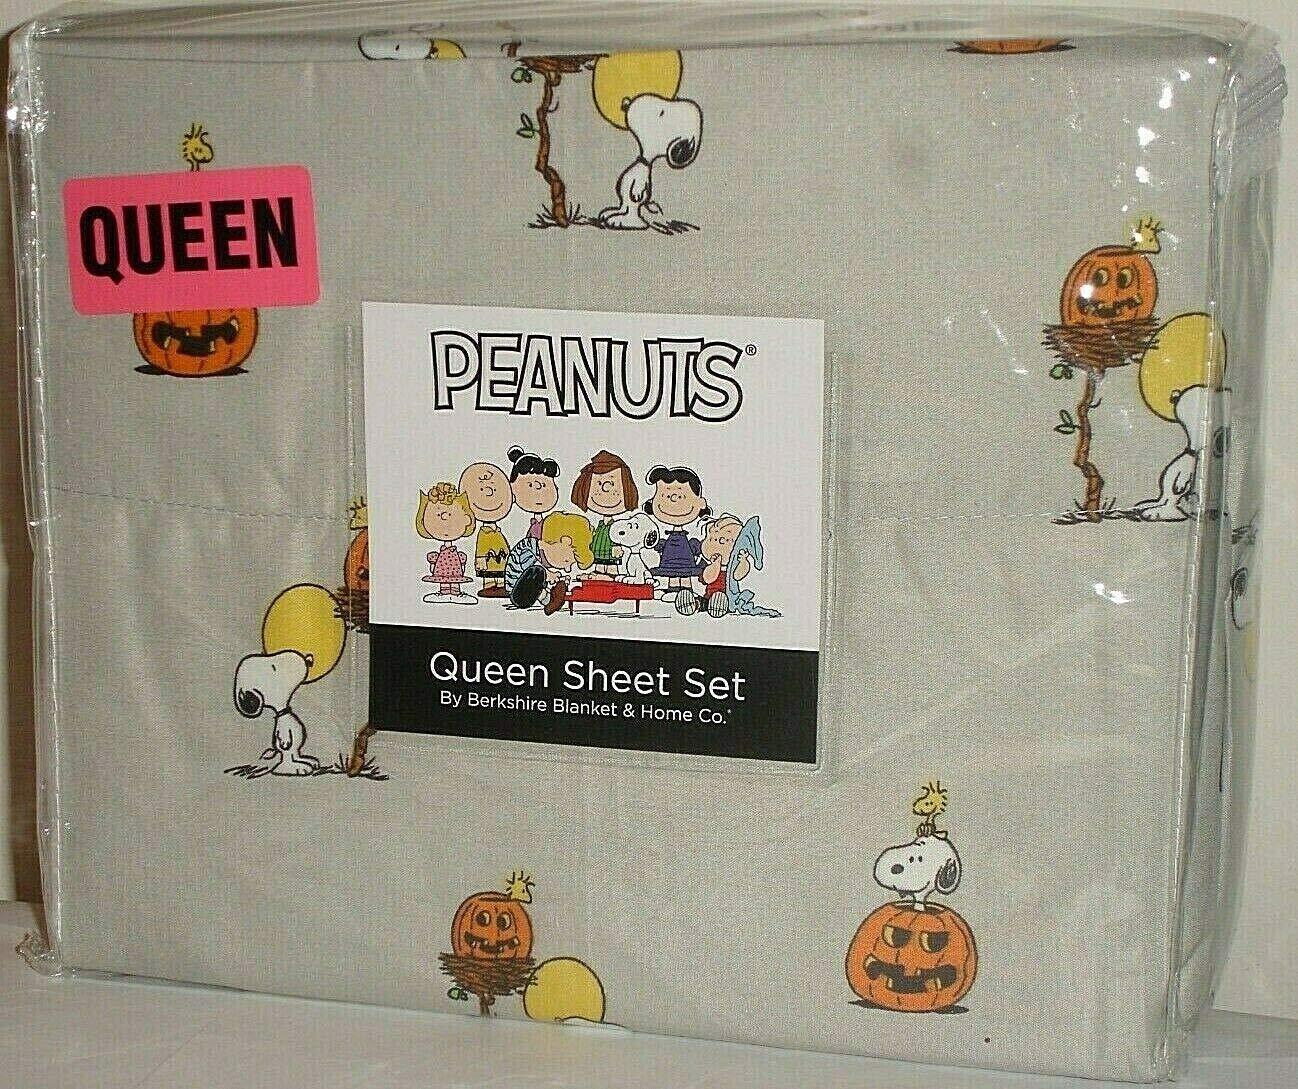 Peanuts Snoopy & Woodstock Halloween Queen Sheet Set by Berkshire ~ Pumpkins! by Berk Shire